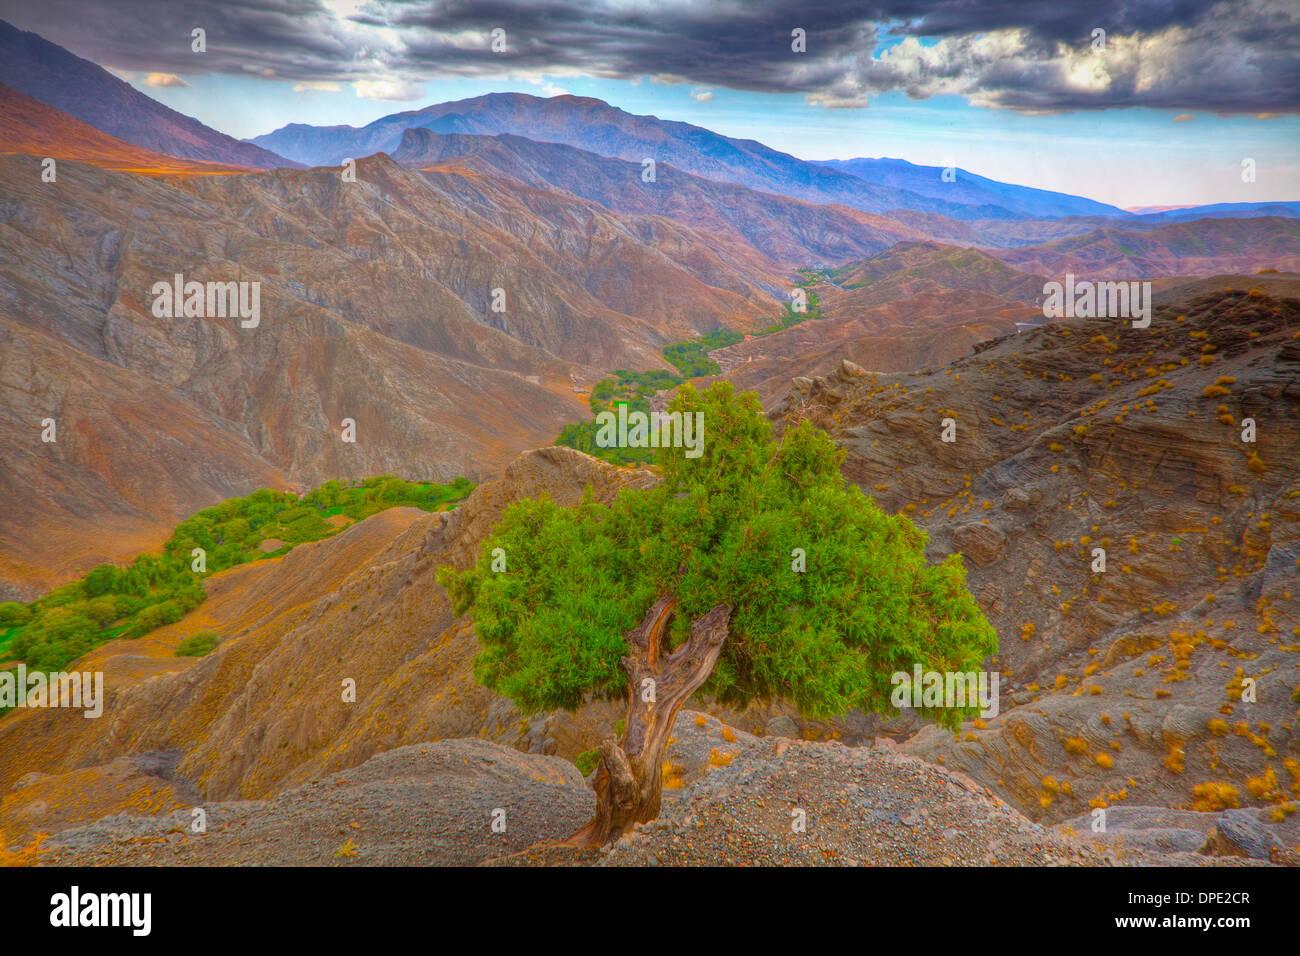 Atlas cedar in Atlas Mountains seen from Tizi n'Tichka Road, Morocco Cedrus atlantica - Stock Image